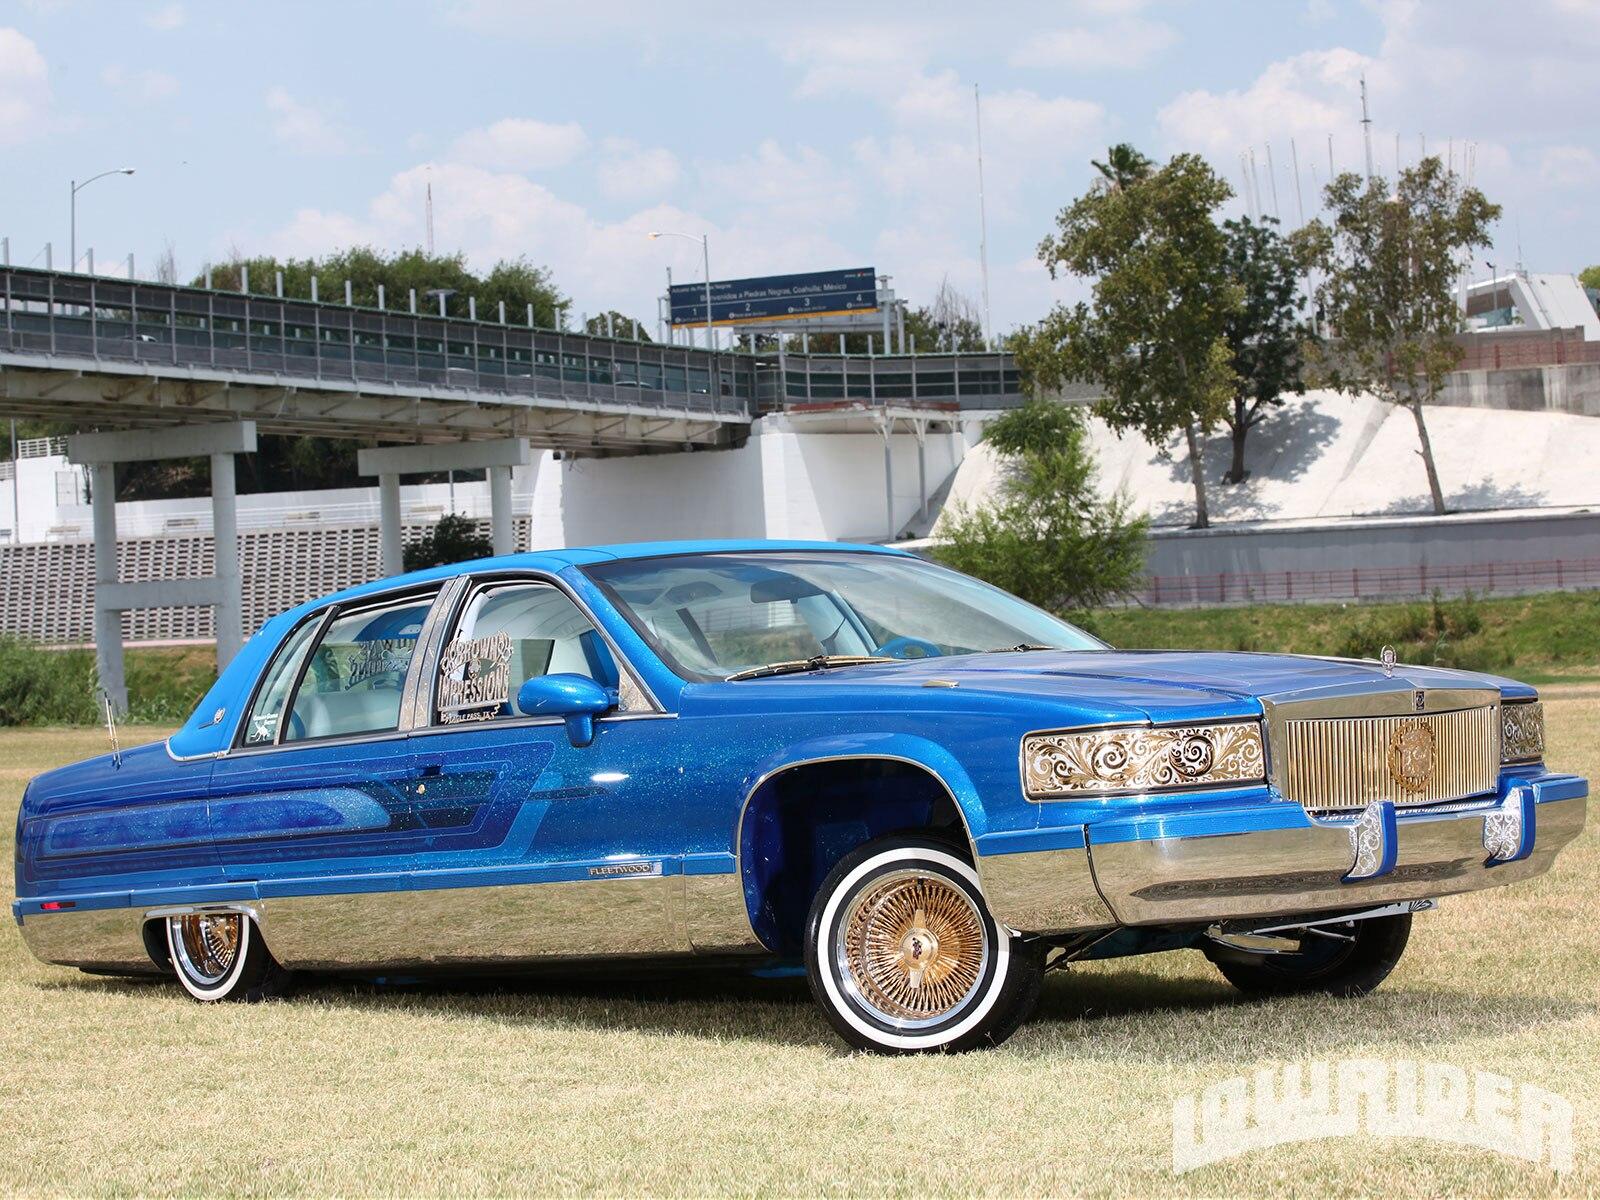 1994 Cadillac Fleetwood - Lowrider Magazine